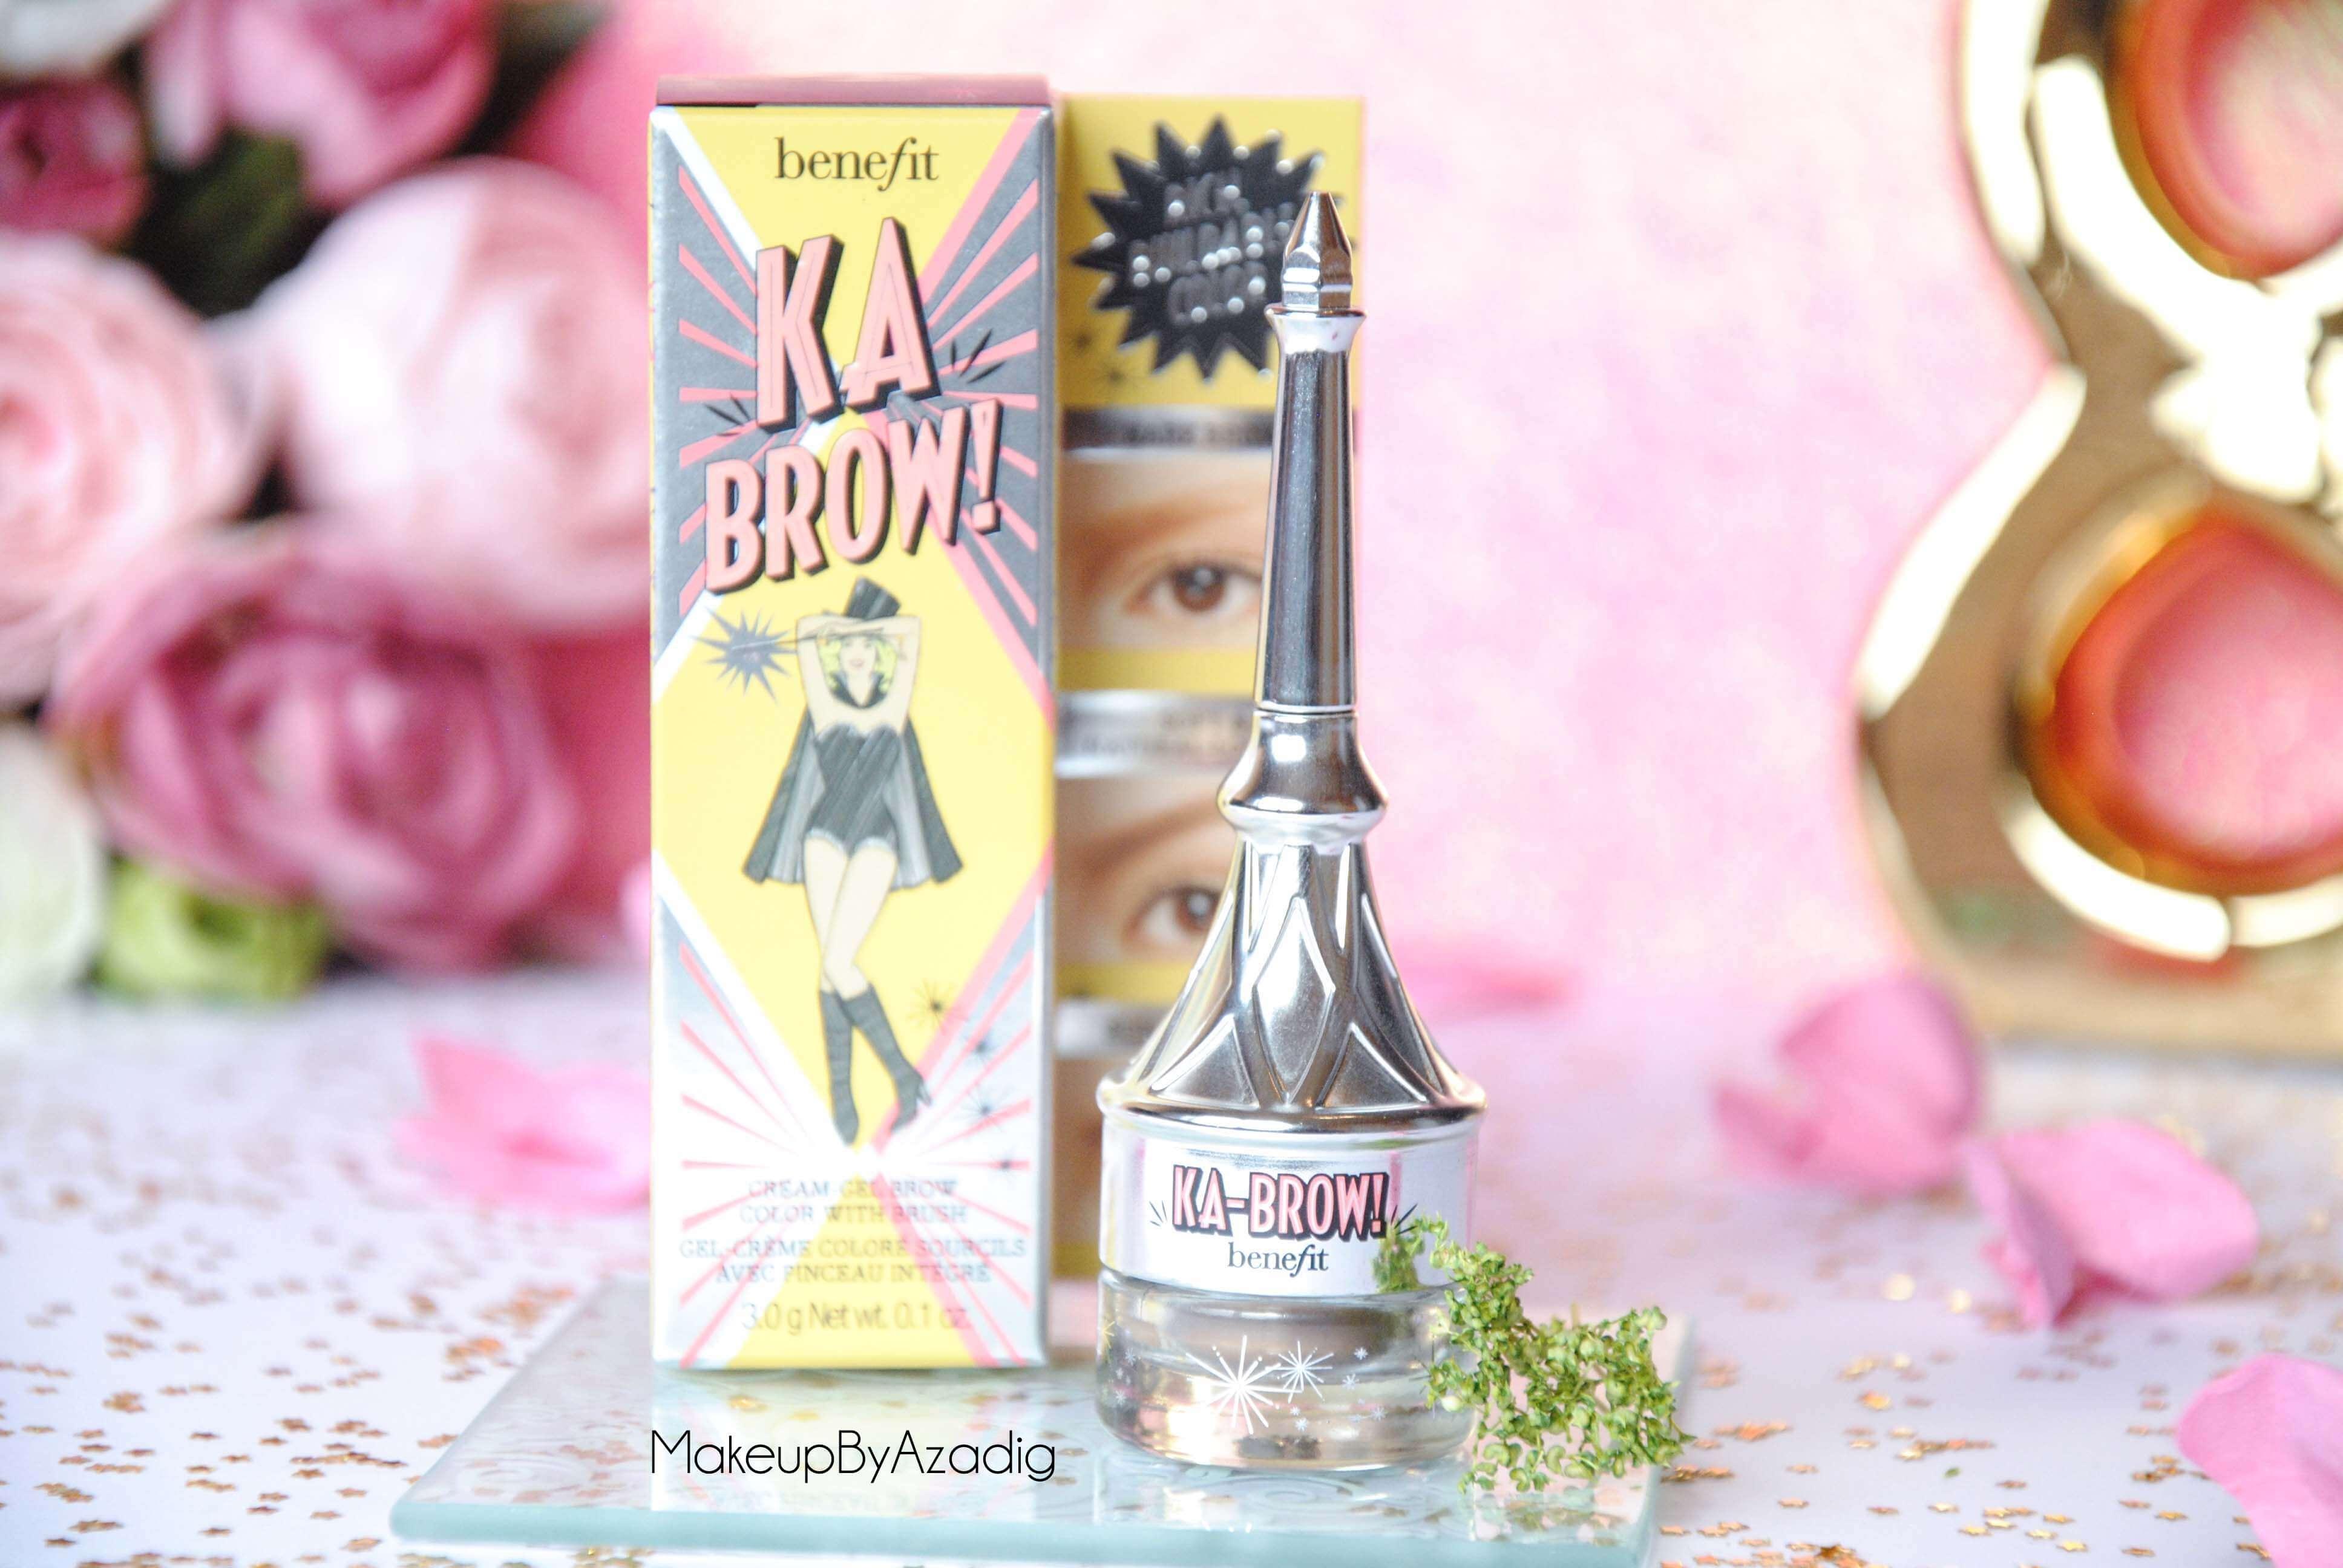 ka-brow-gel-creme-coloration-sourcils-benefit-makeupbyazadig-paris-blog-revue-avis-prix-enjoyphoenix-miniature